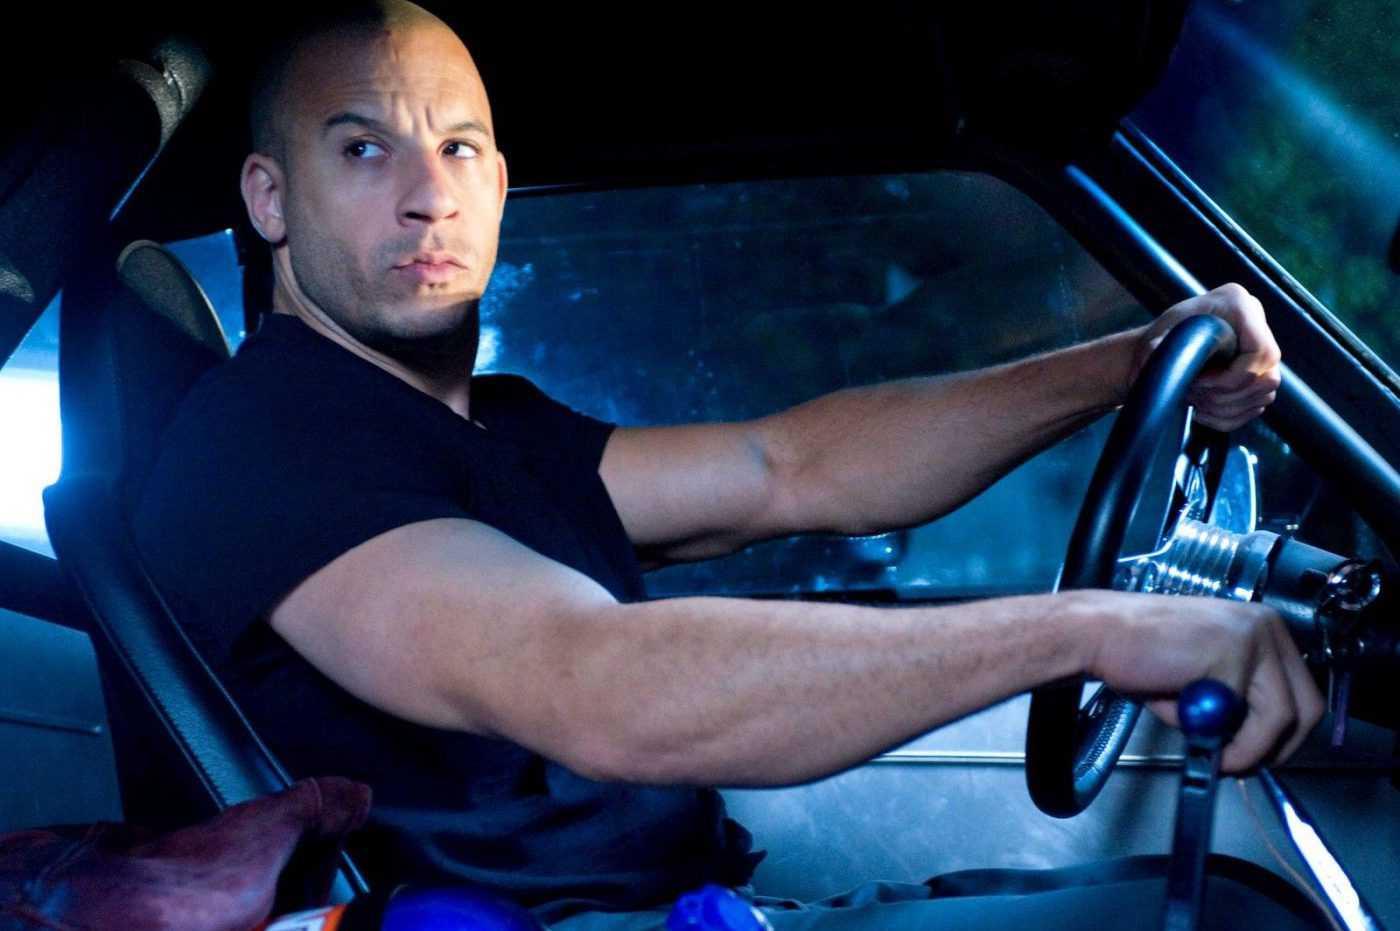 Fast and Furious 9 : Vin Diesel tease le prochain opus